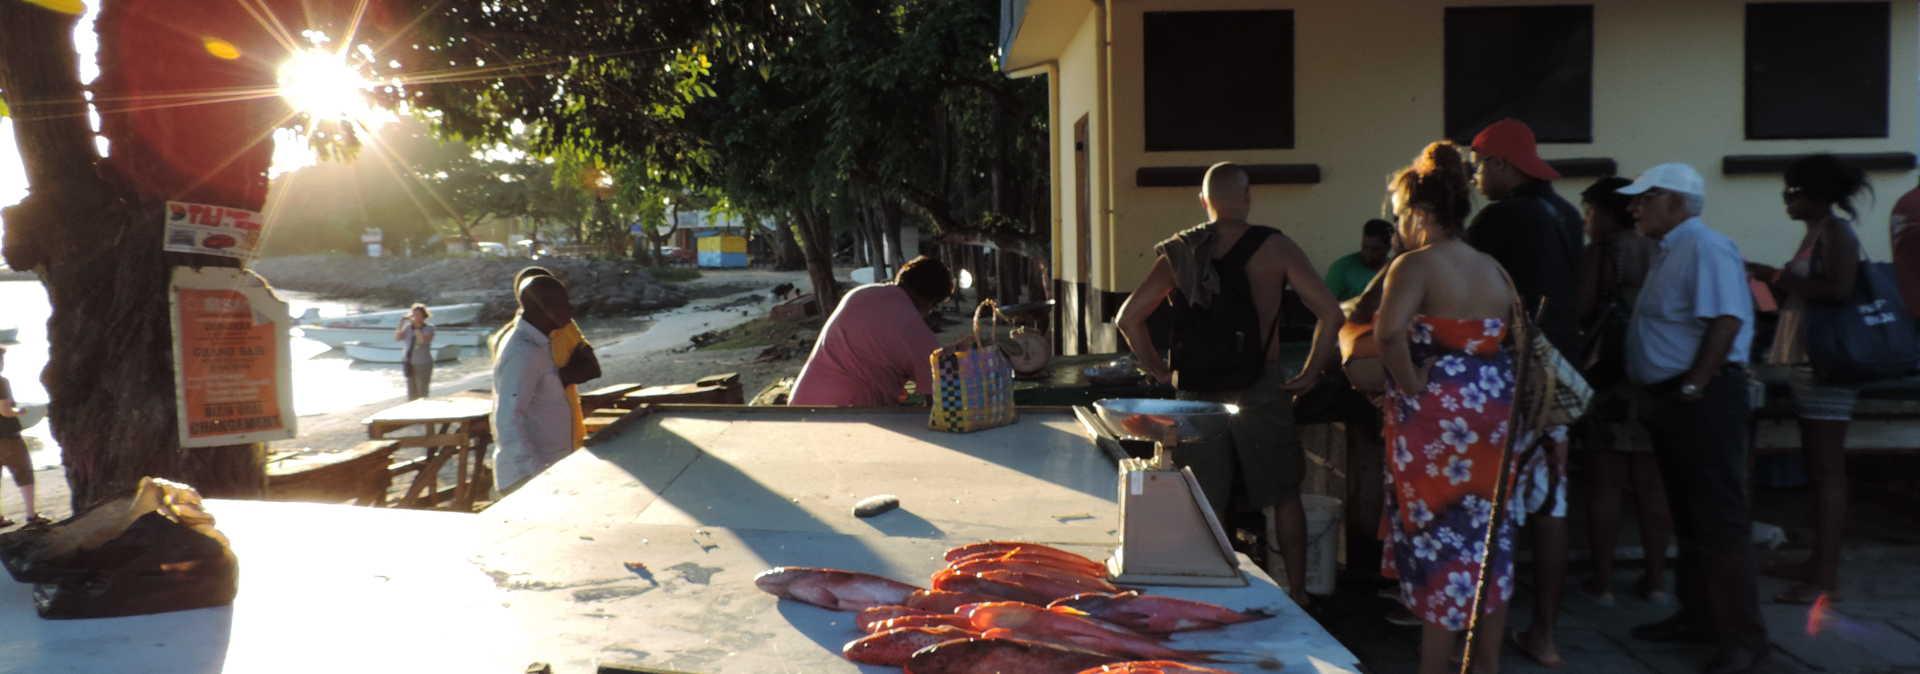 Fischmarkt in Grand Baie